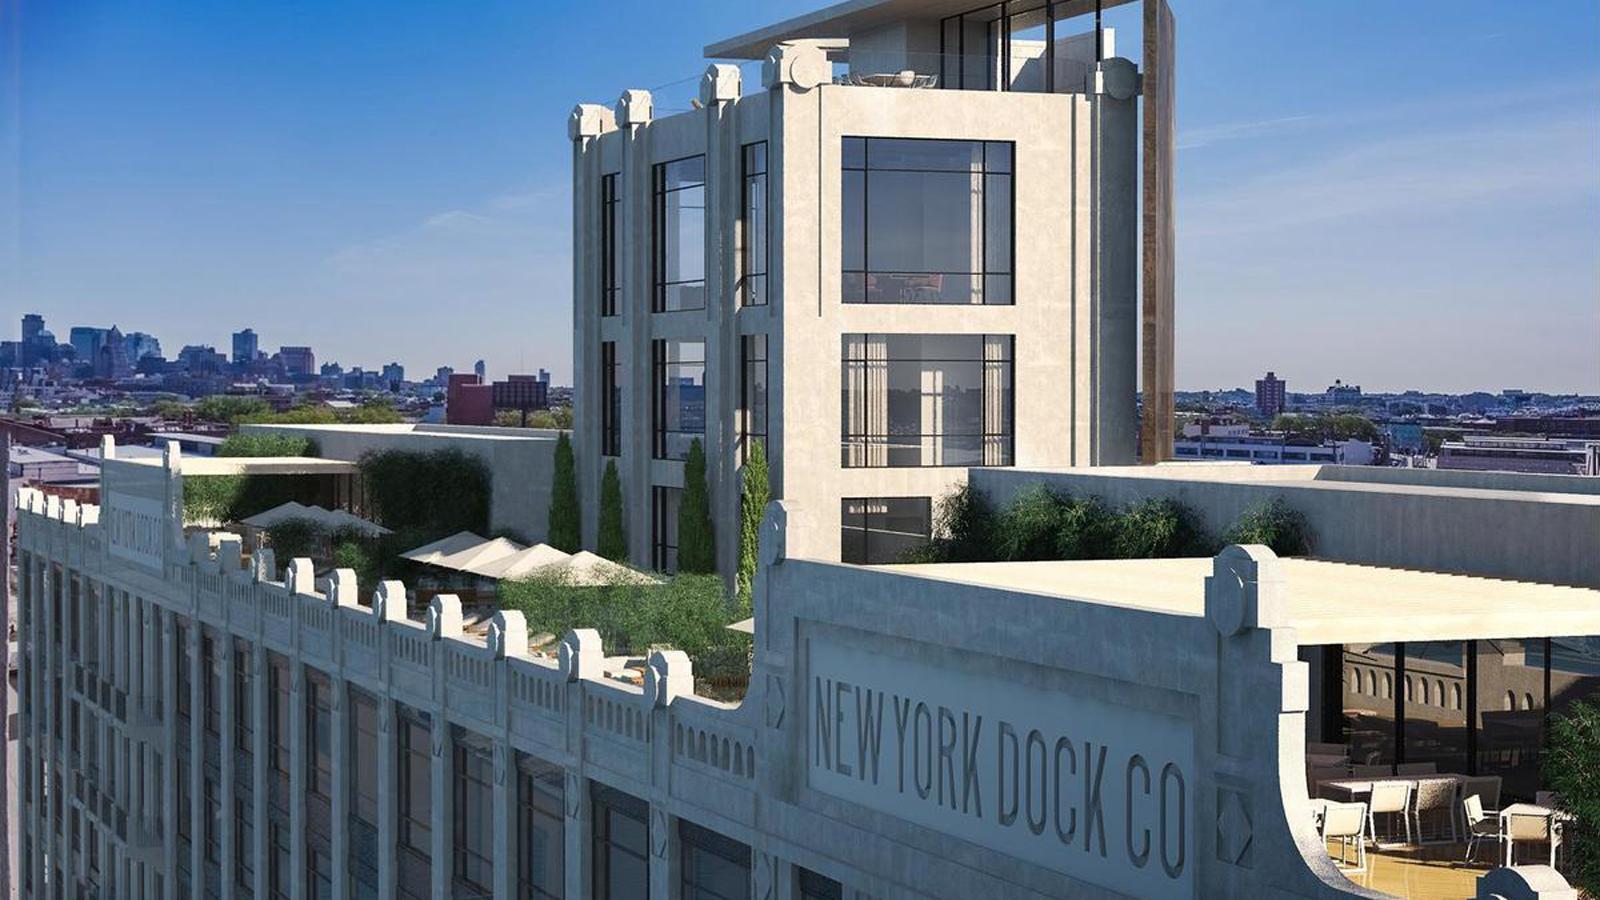 The New York Dock Building, 160 Imlay Street